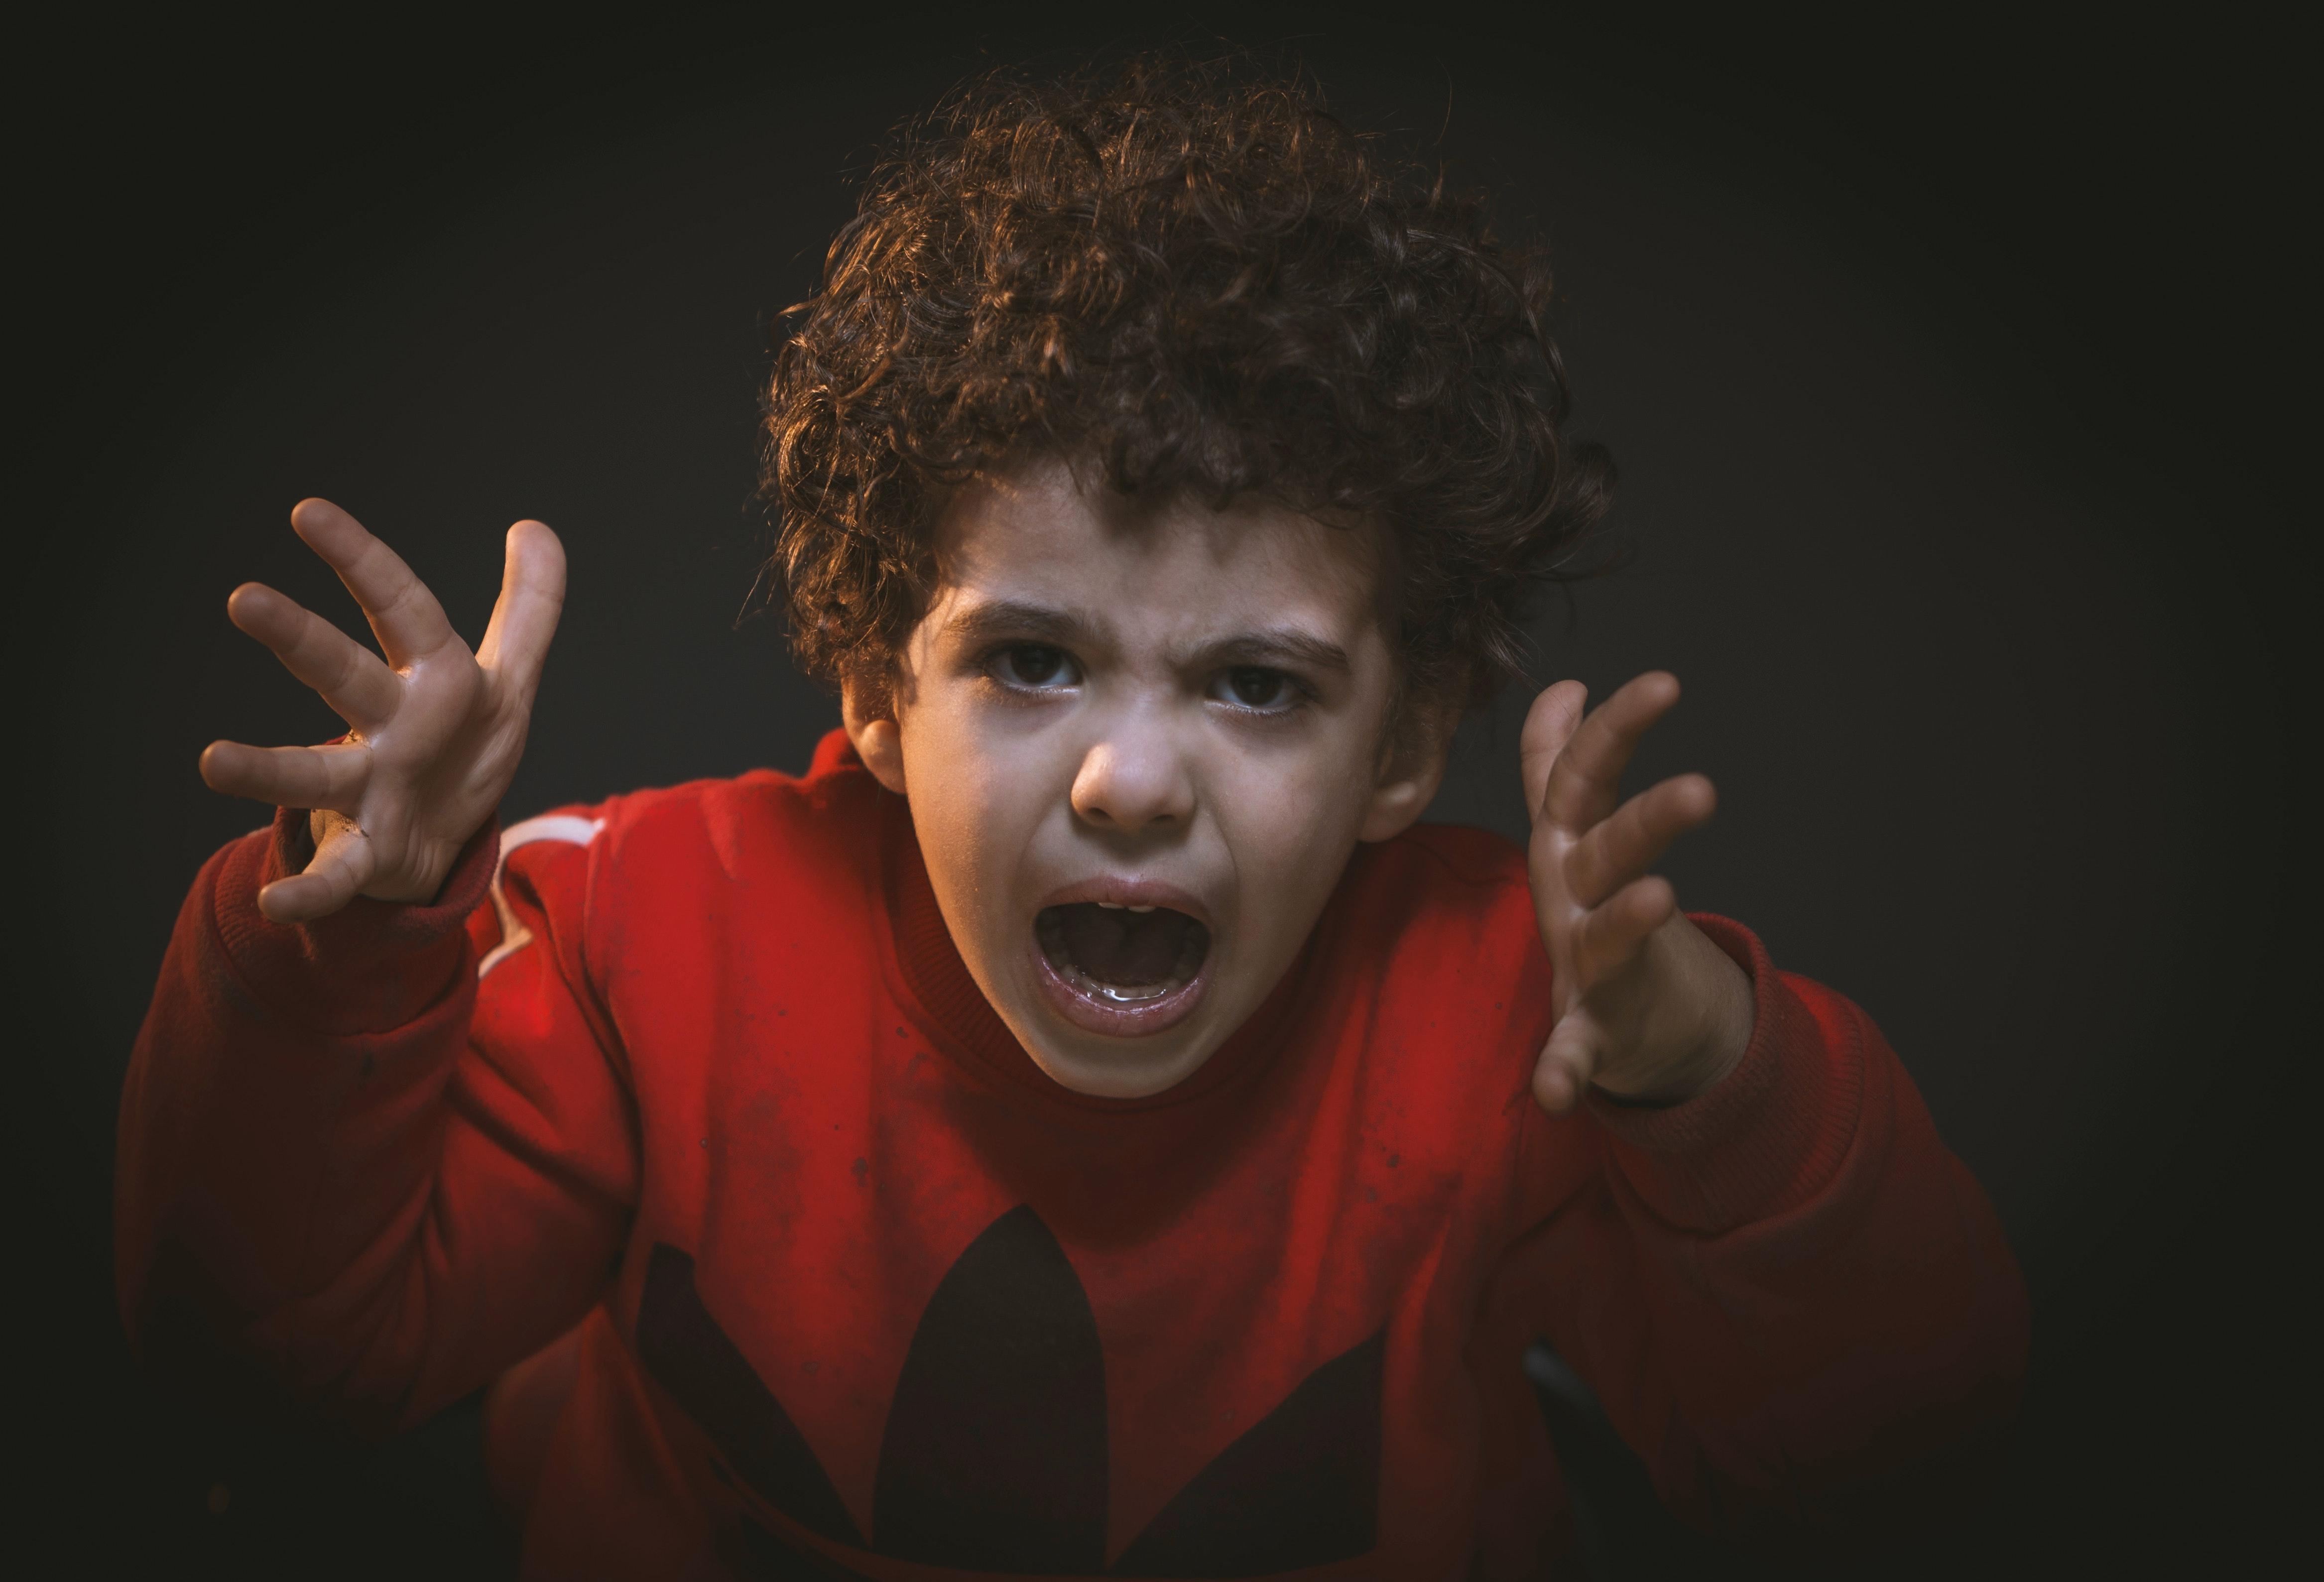 Understanding and Managing Temper Tantrums in Toddlers and Preschoolers